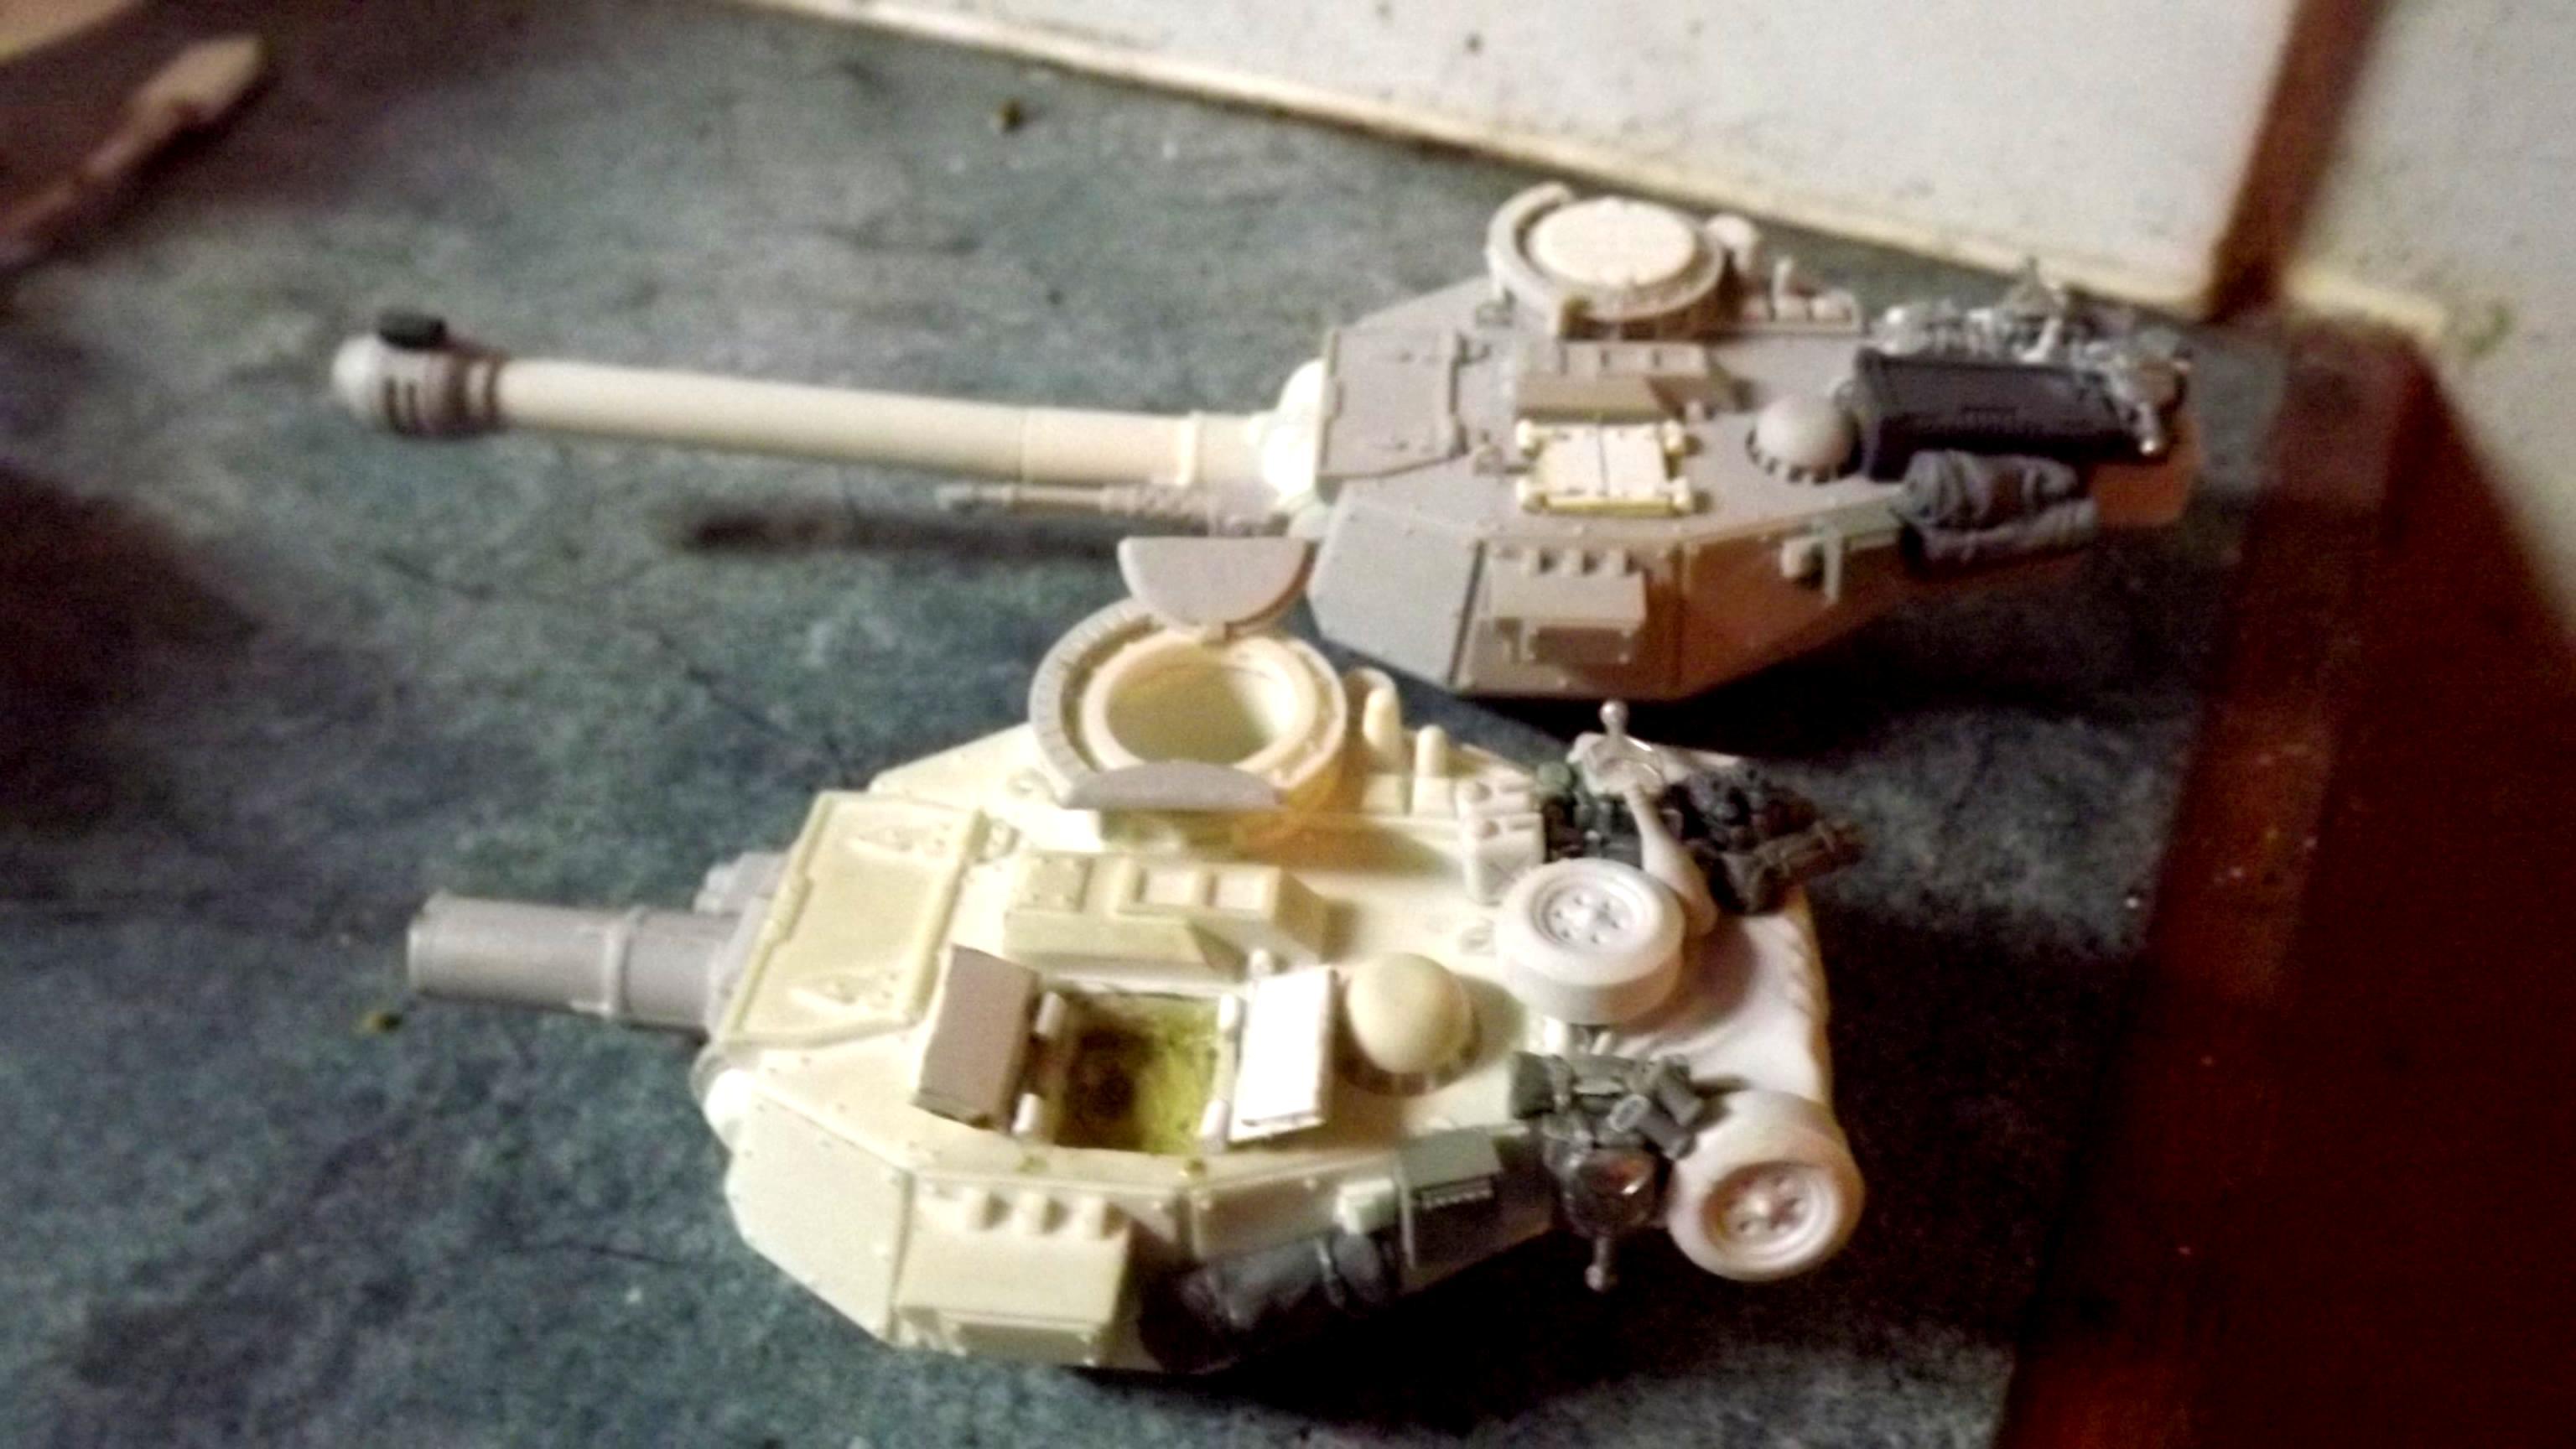 Battle Cannon, Buttoned Up, Medium Tank, Mortian Tank, Stowage, Vanquiser Cannon